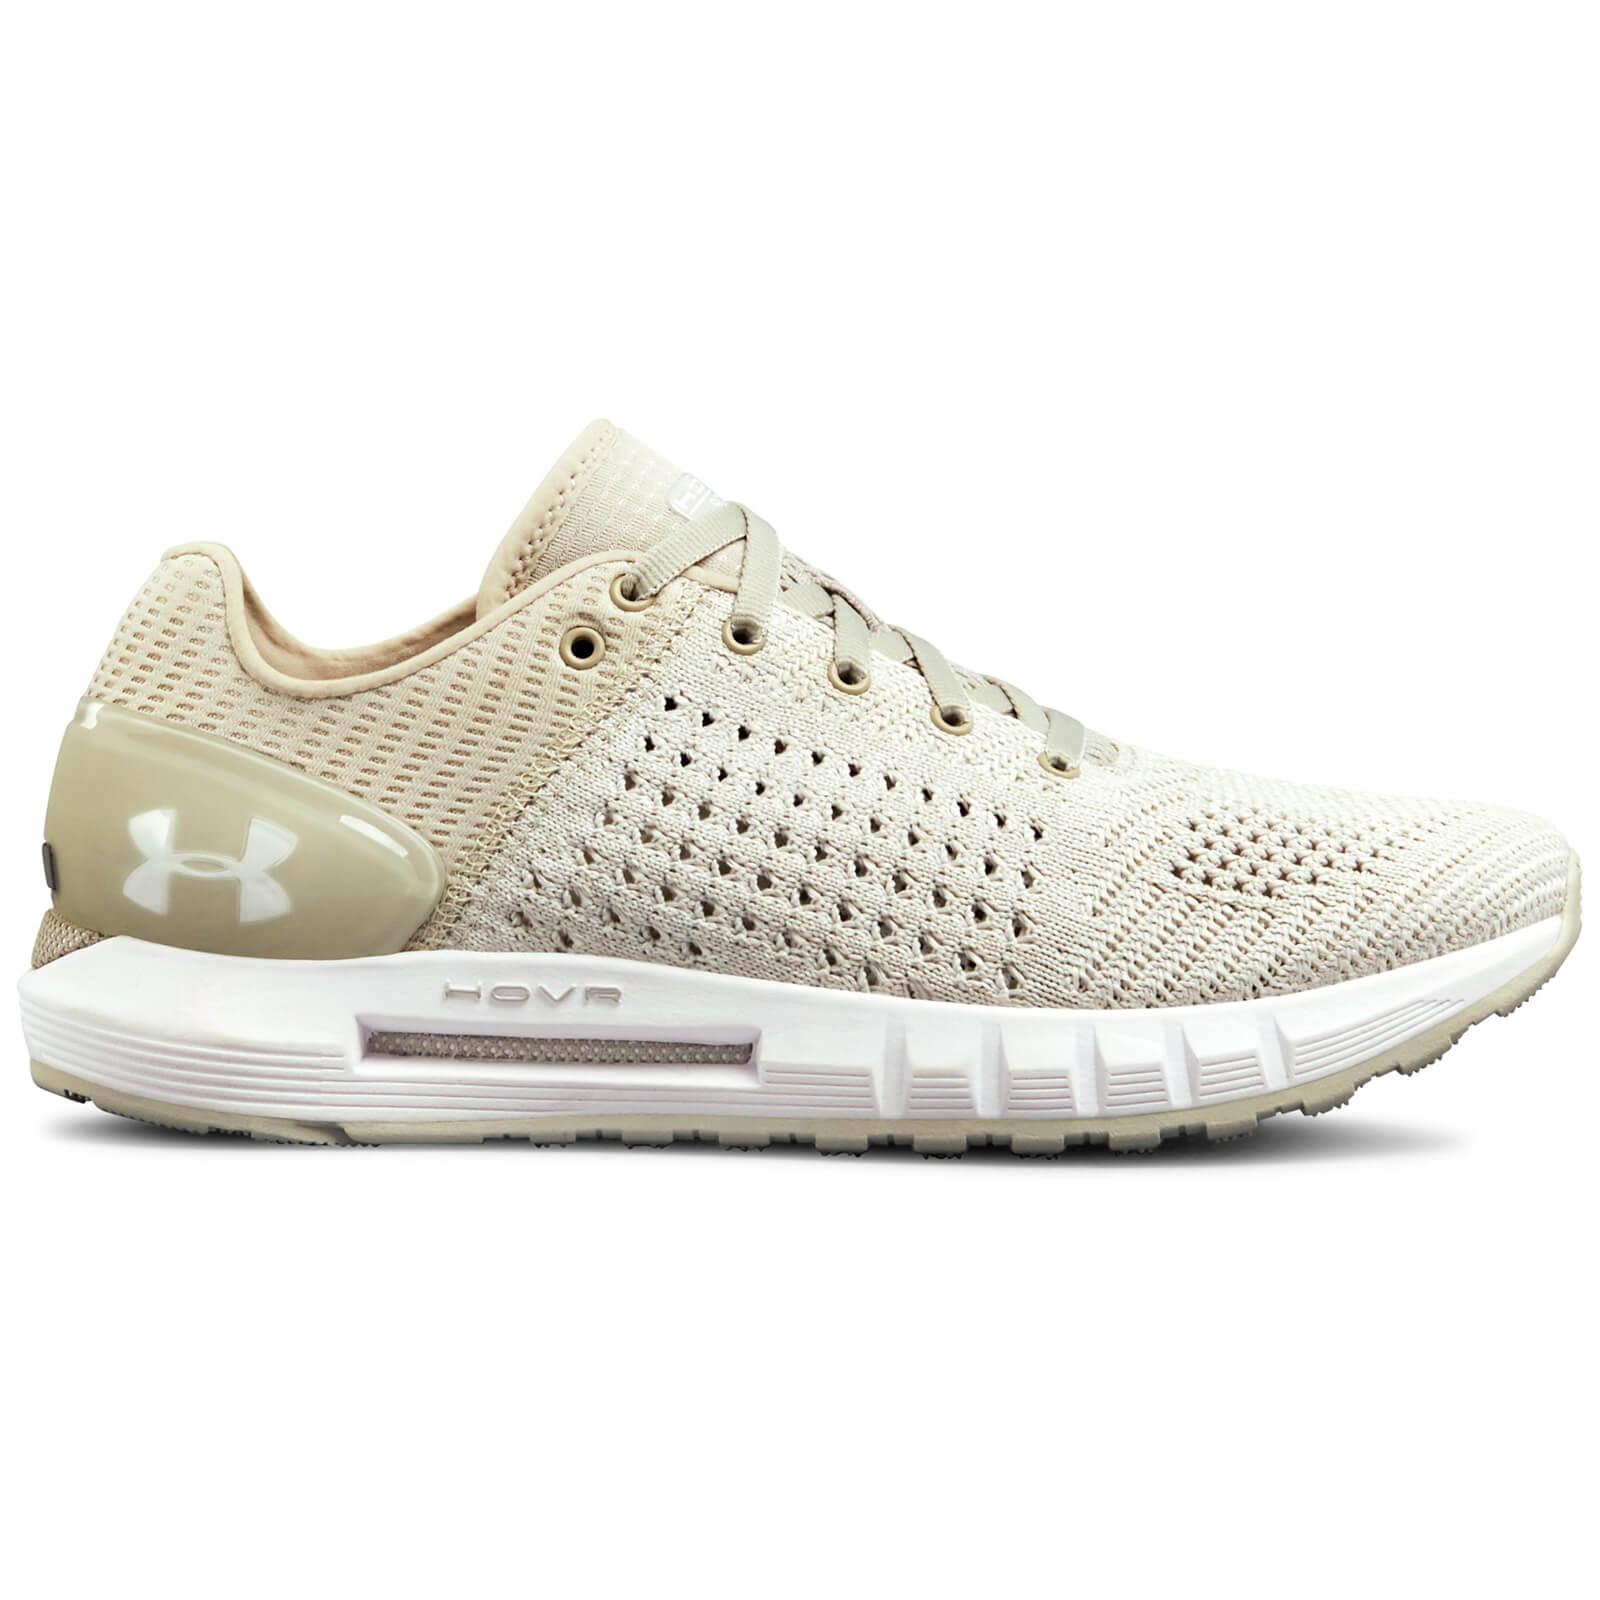 Under Armour Women's HOVR Sonic NC Running Shoes - White - US 8.5/UK 6 - White